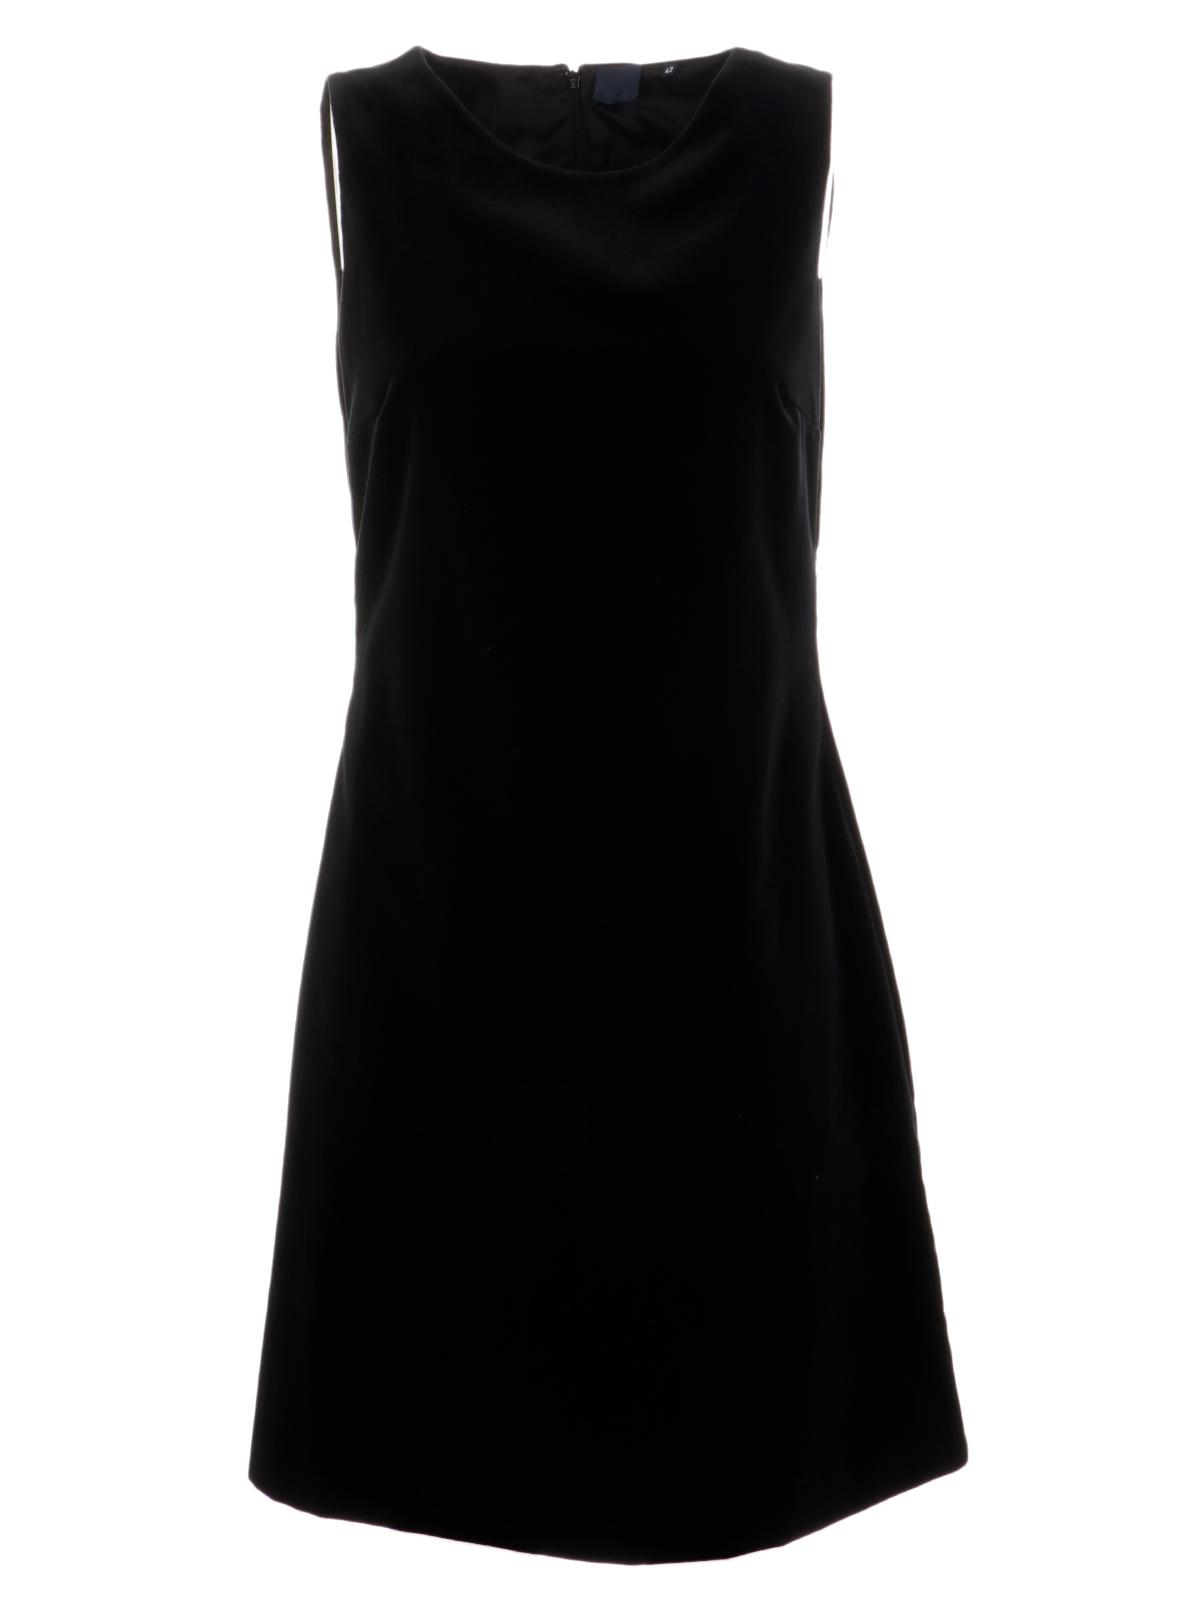 WhyCi Jersey Dress 001  c4cd9243ab1